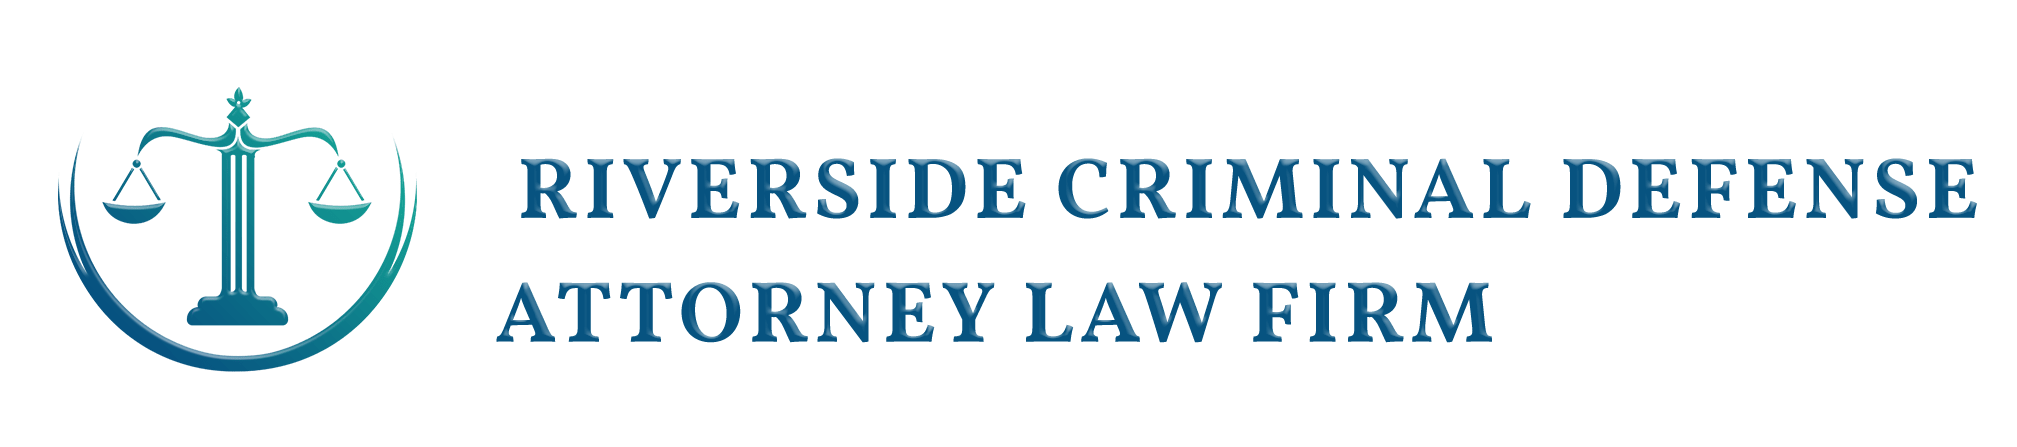 Riverside Criminal Defense Attorney Law Firm